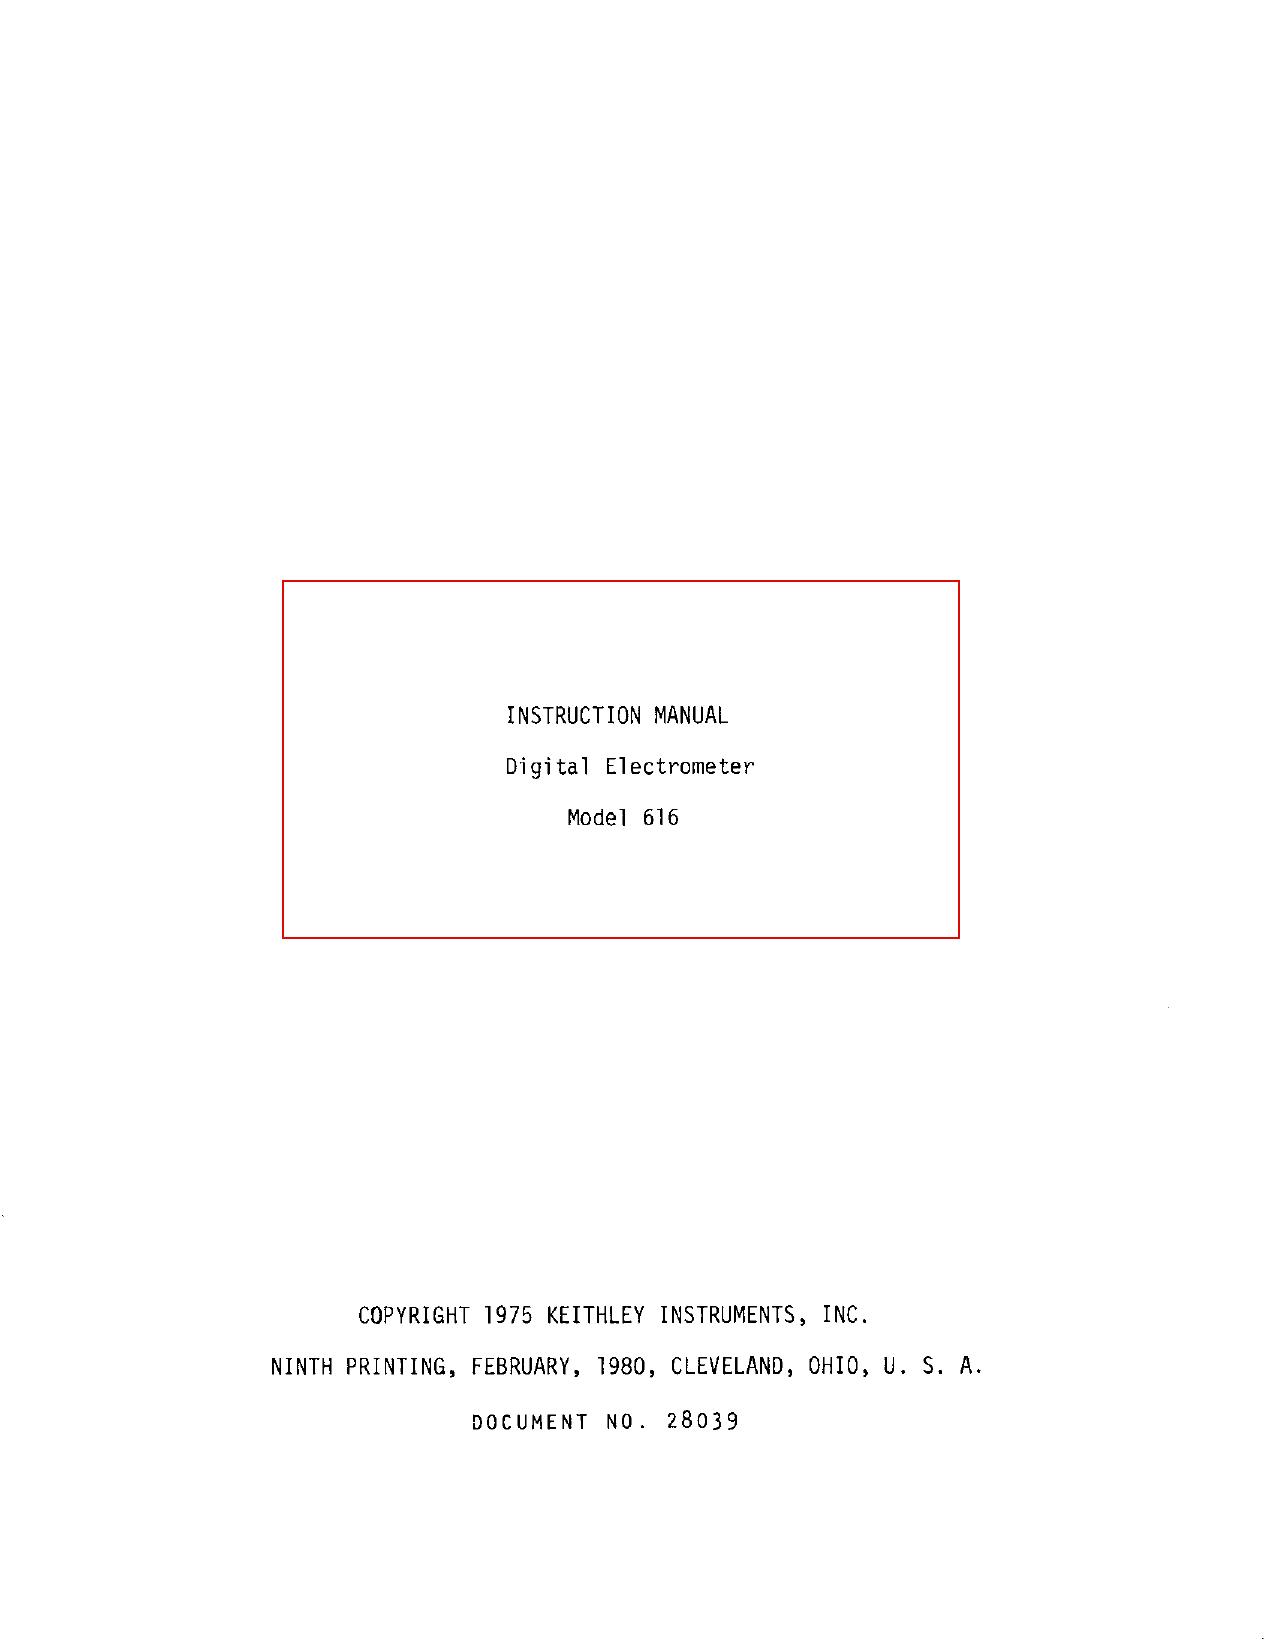 INSTRUCTION MANUAL Digital Electrometer Model | manualzz com